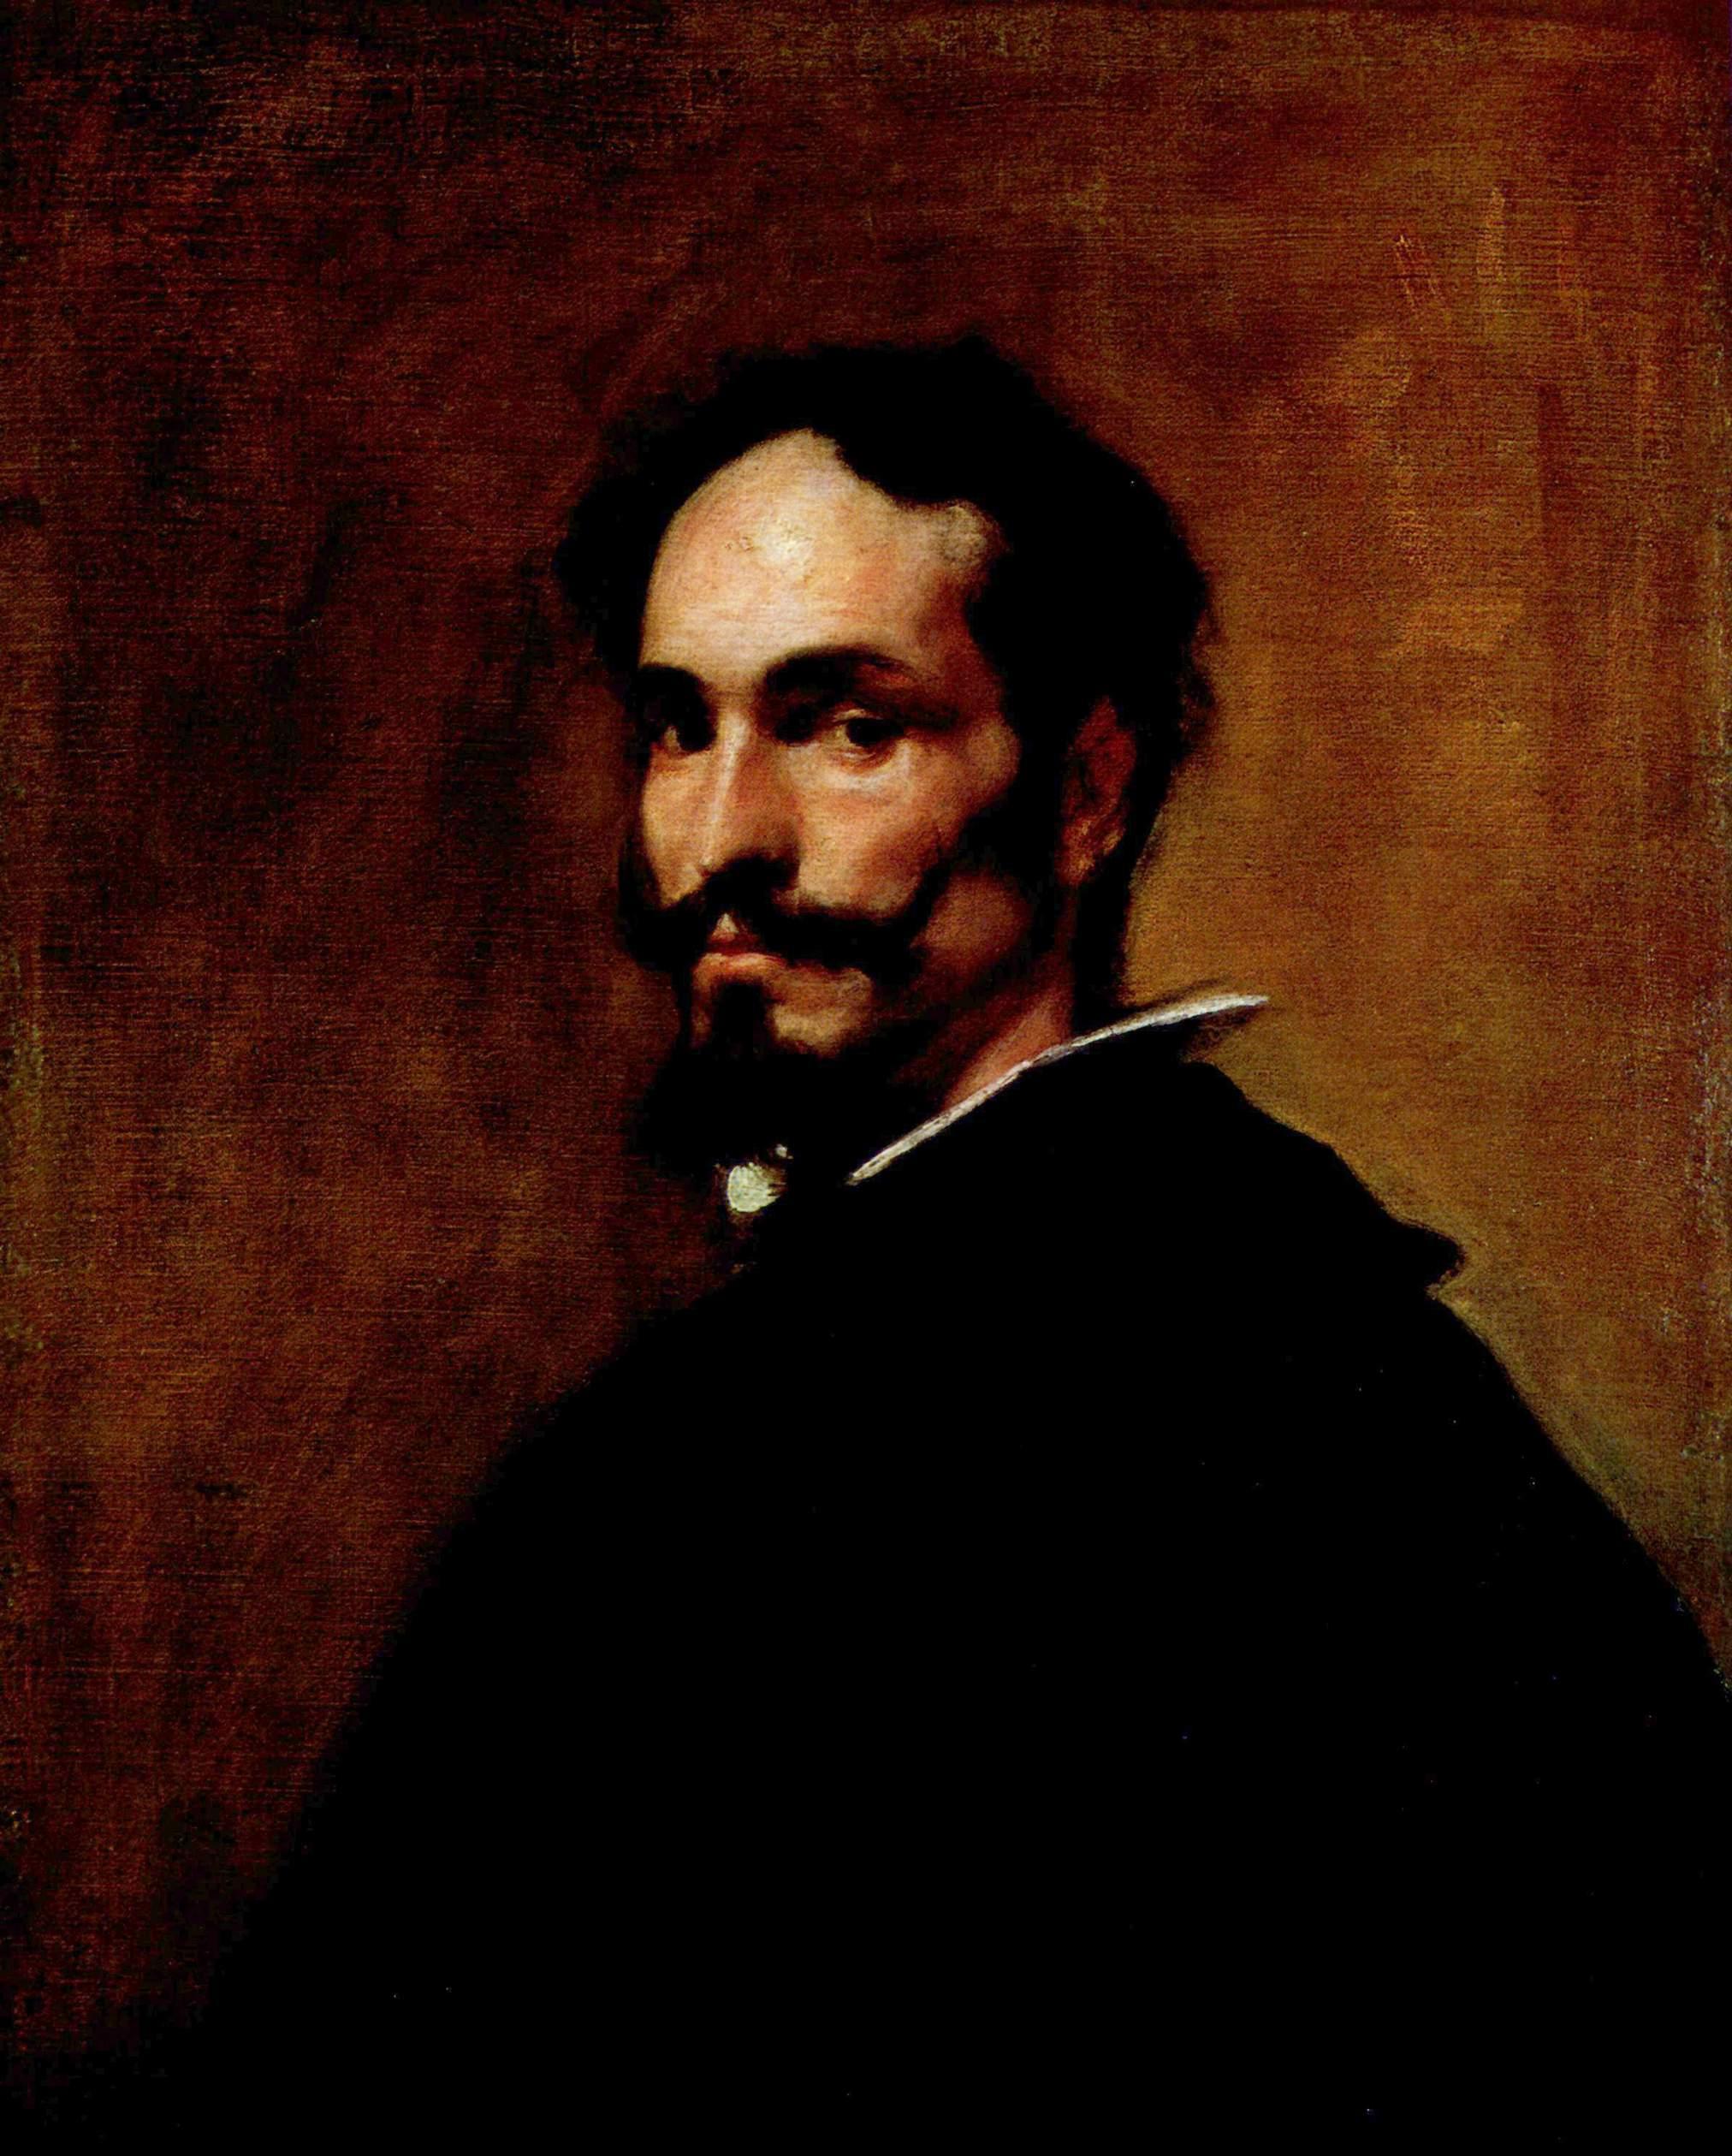 Diego Velázquez - Retrato de un hombre | Artelista.com